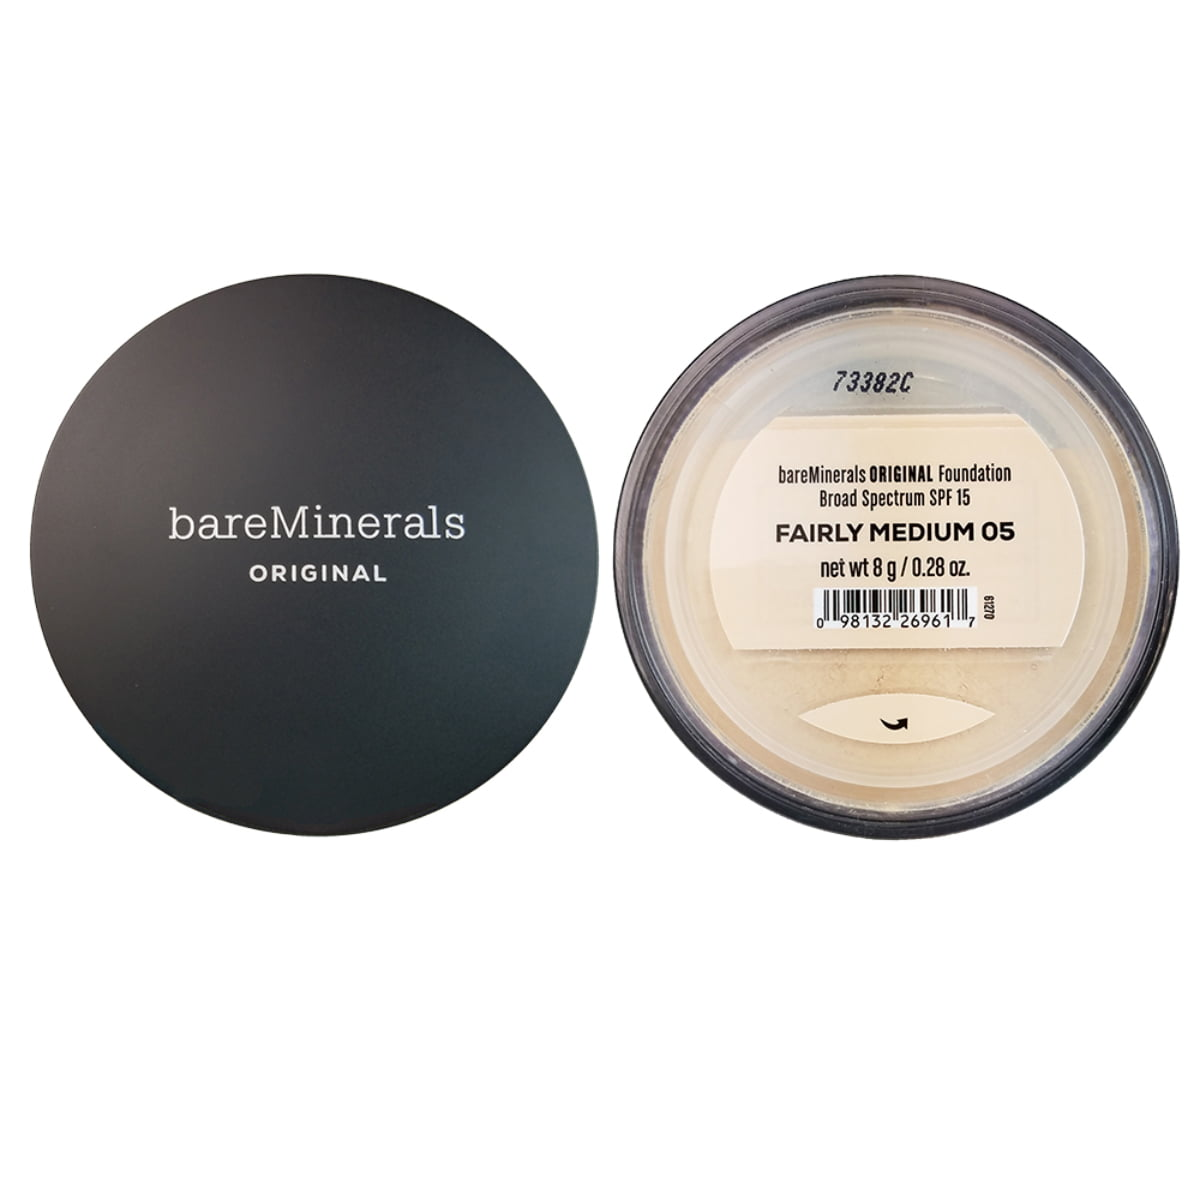 Bareminerals 32 Value Bareminerals Original Loose Powder Foundation Spf 15 05 Fairly Medium 0 28 Oz Walmart Com Walmart Com